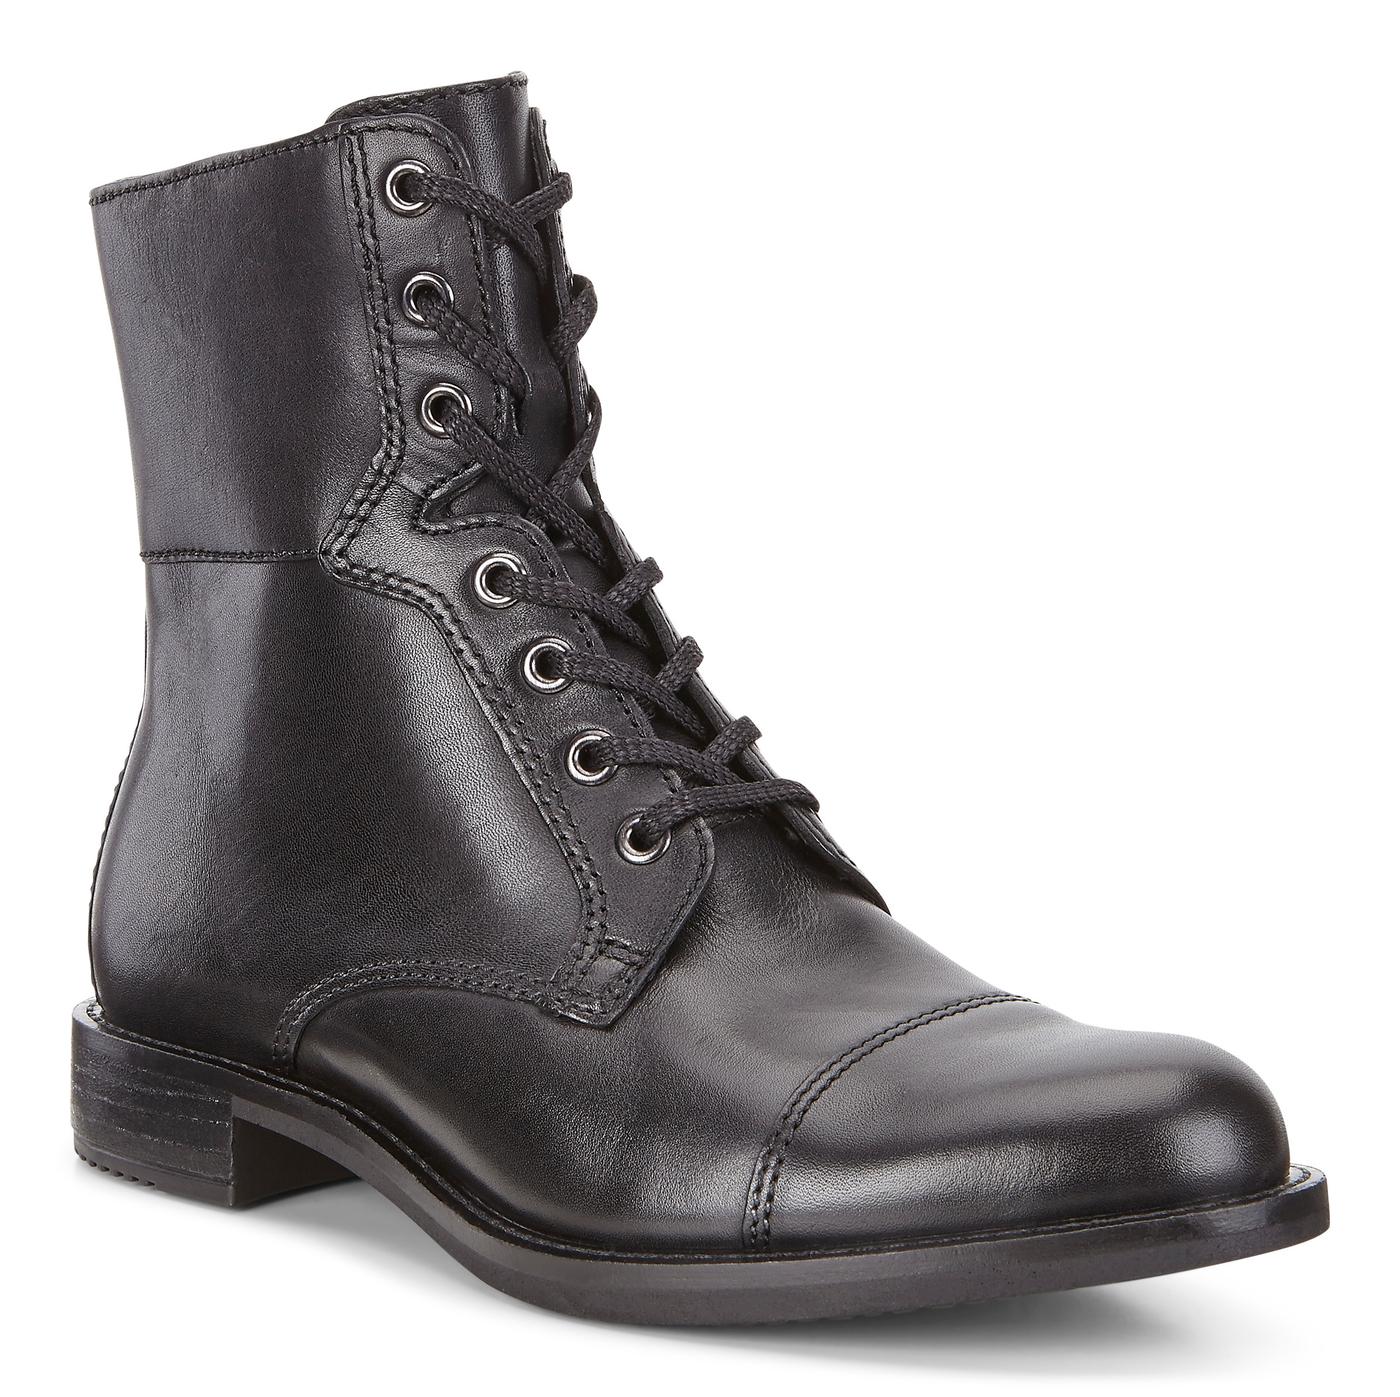 ECCO Sartorelle 25 Combat Boot